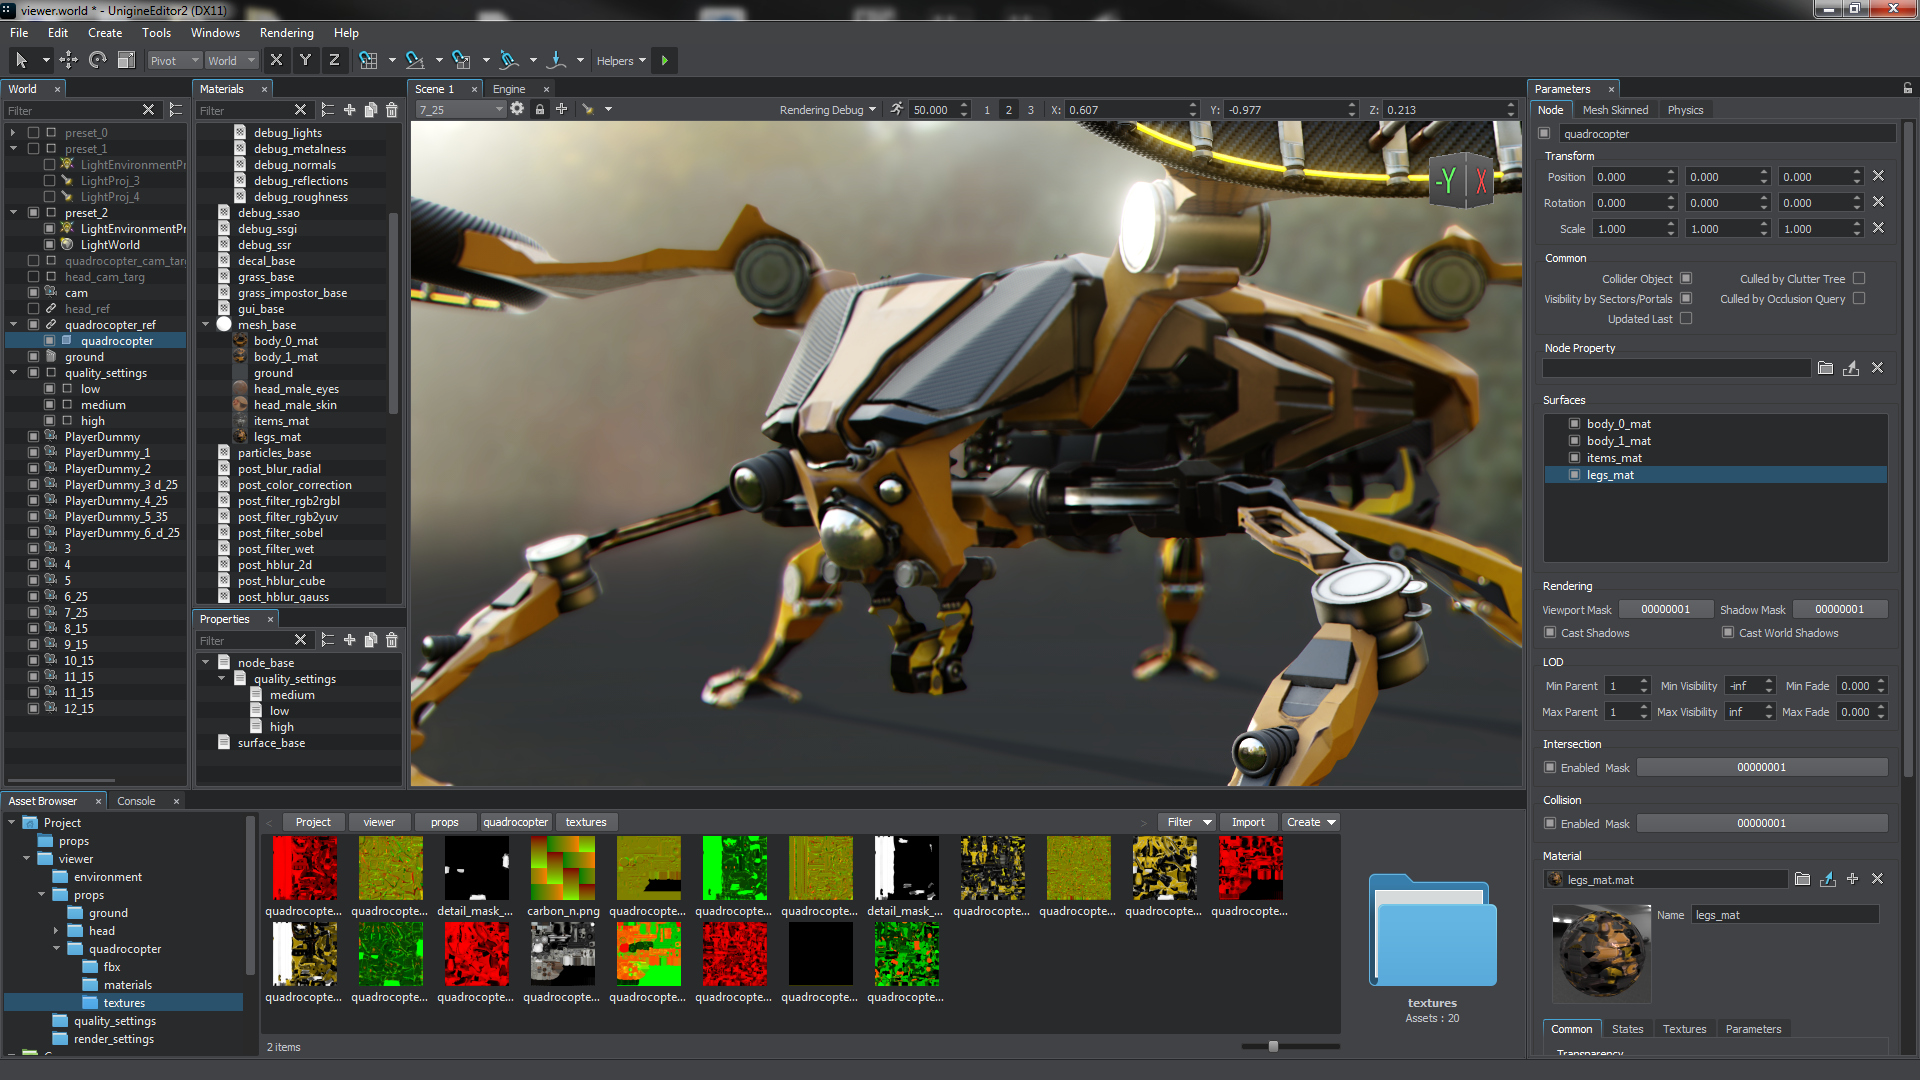 UNIGINE 2 6: Editor2, Improved Multi-Channel Rendering